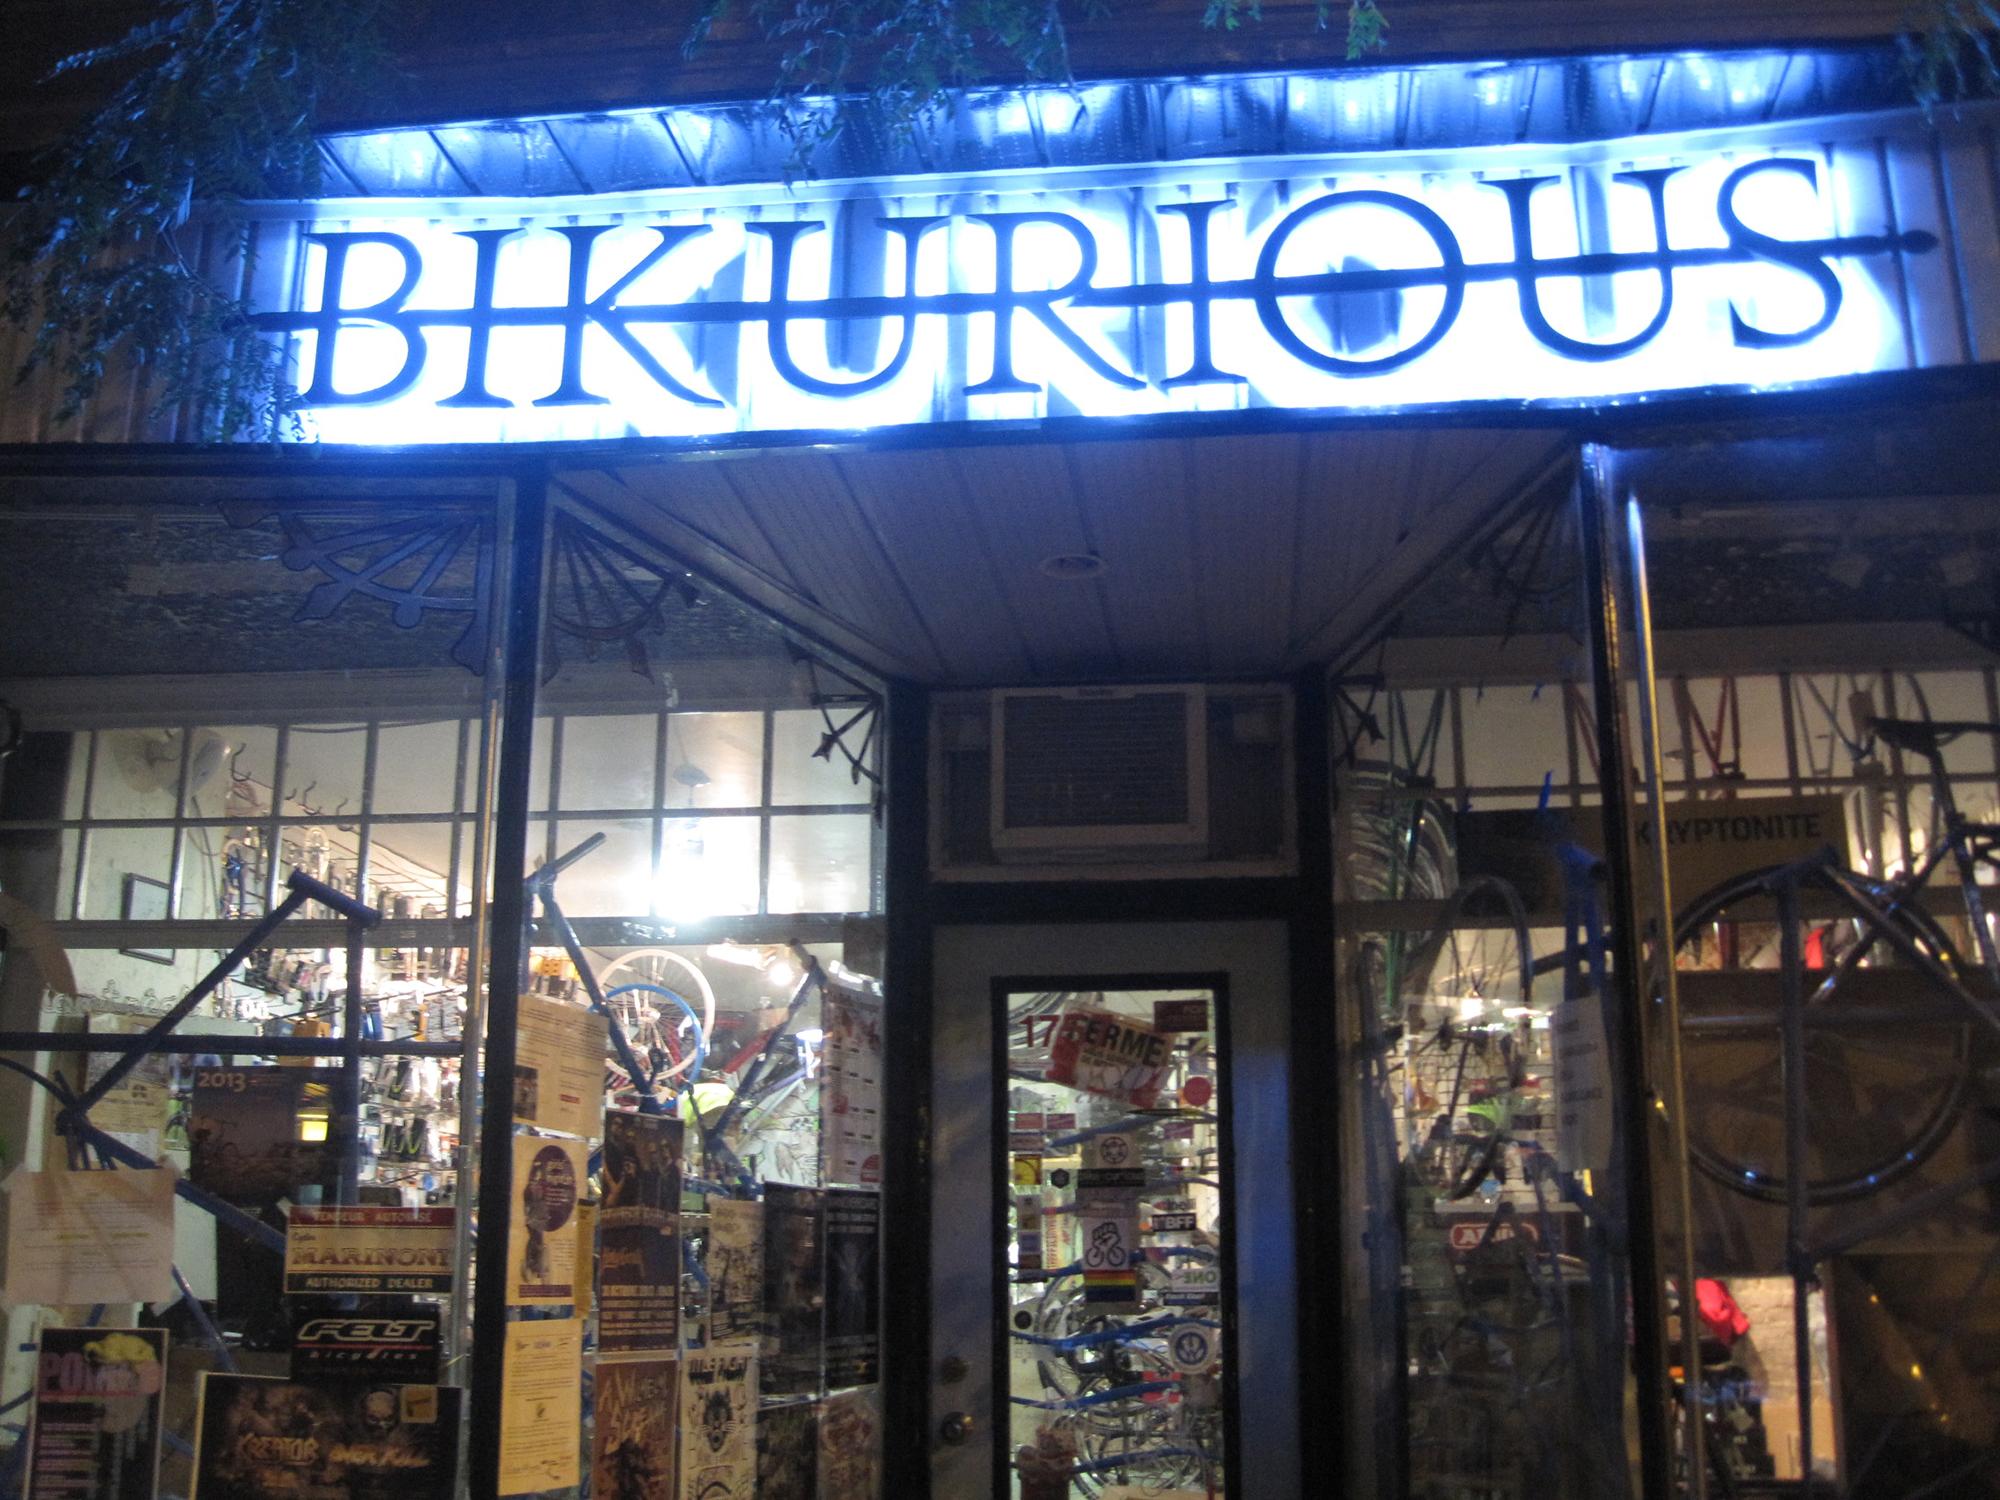 bikurious enseigne sur mesureSQUARESPACE.jpg